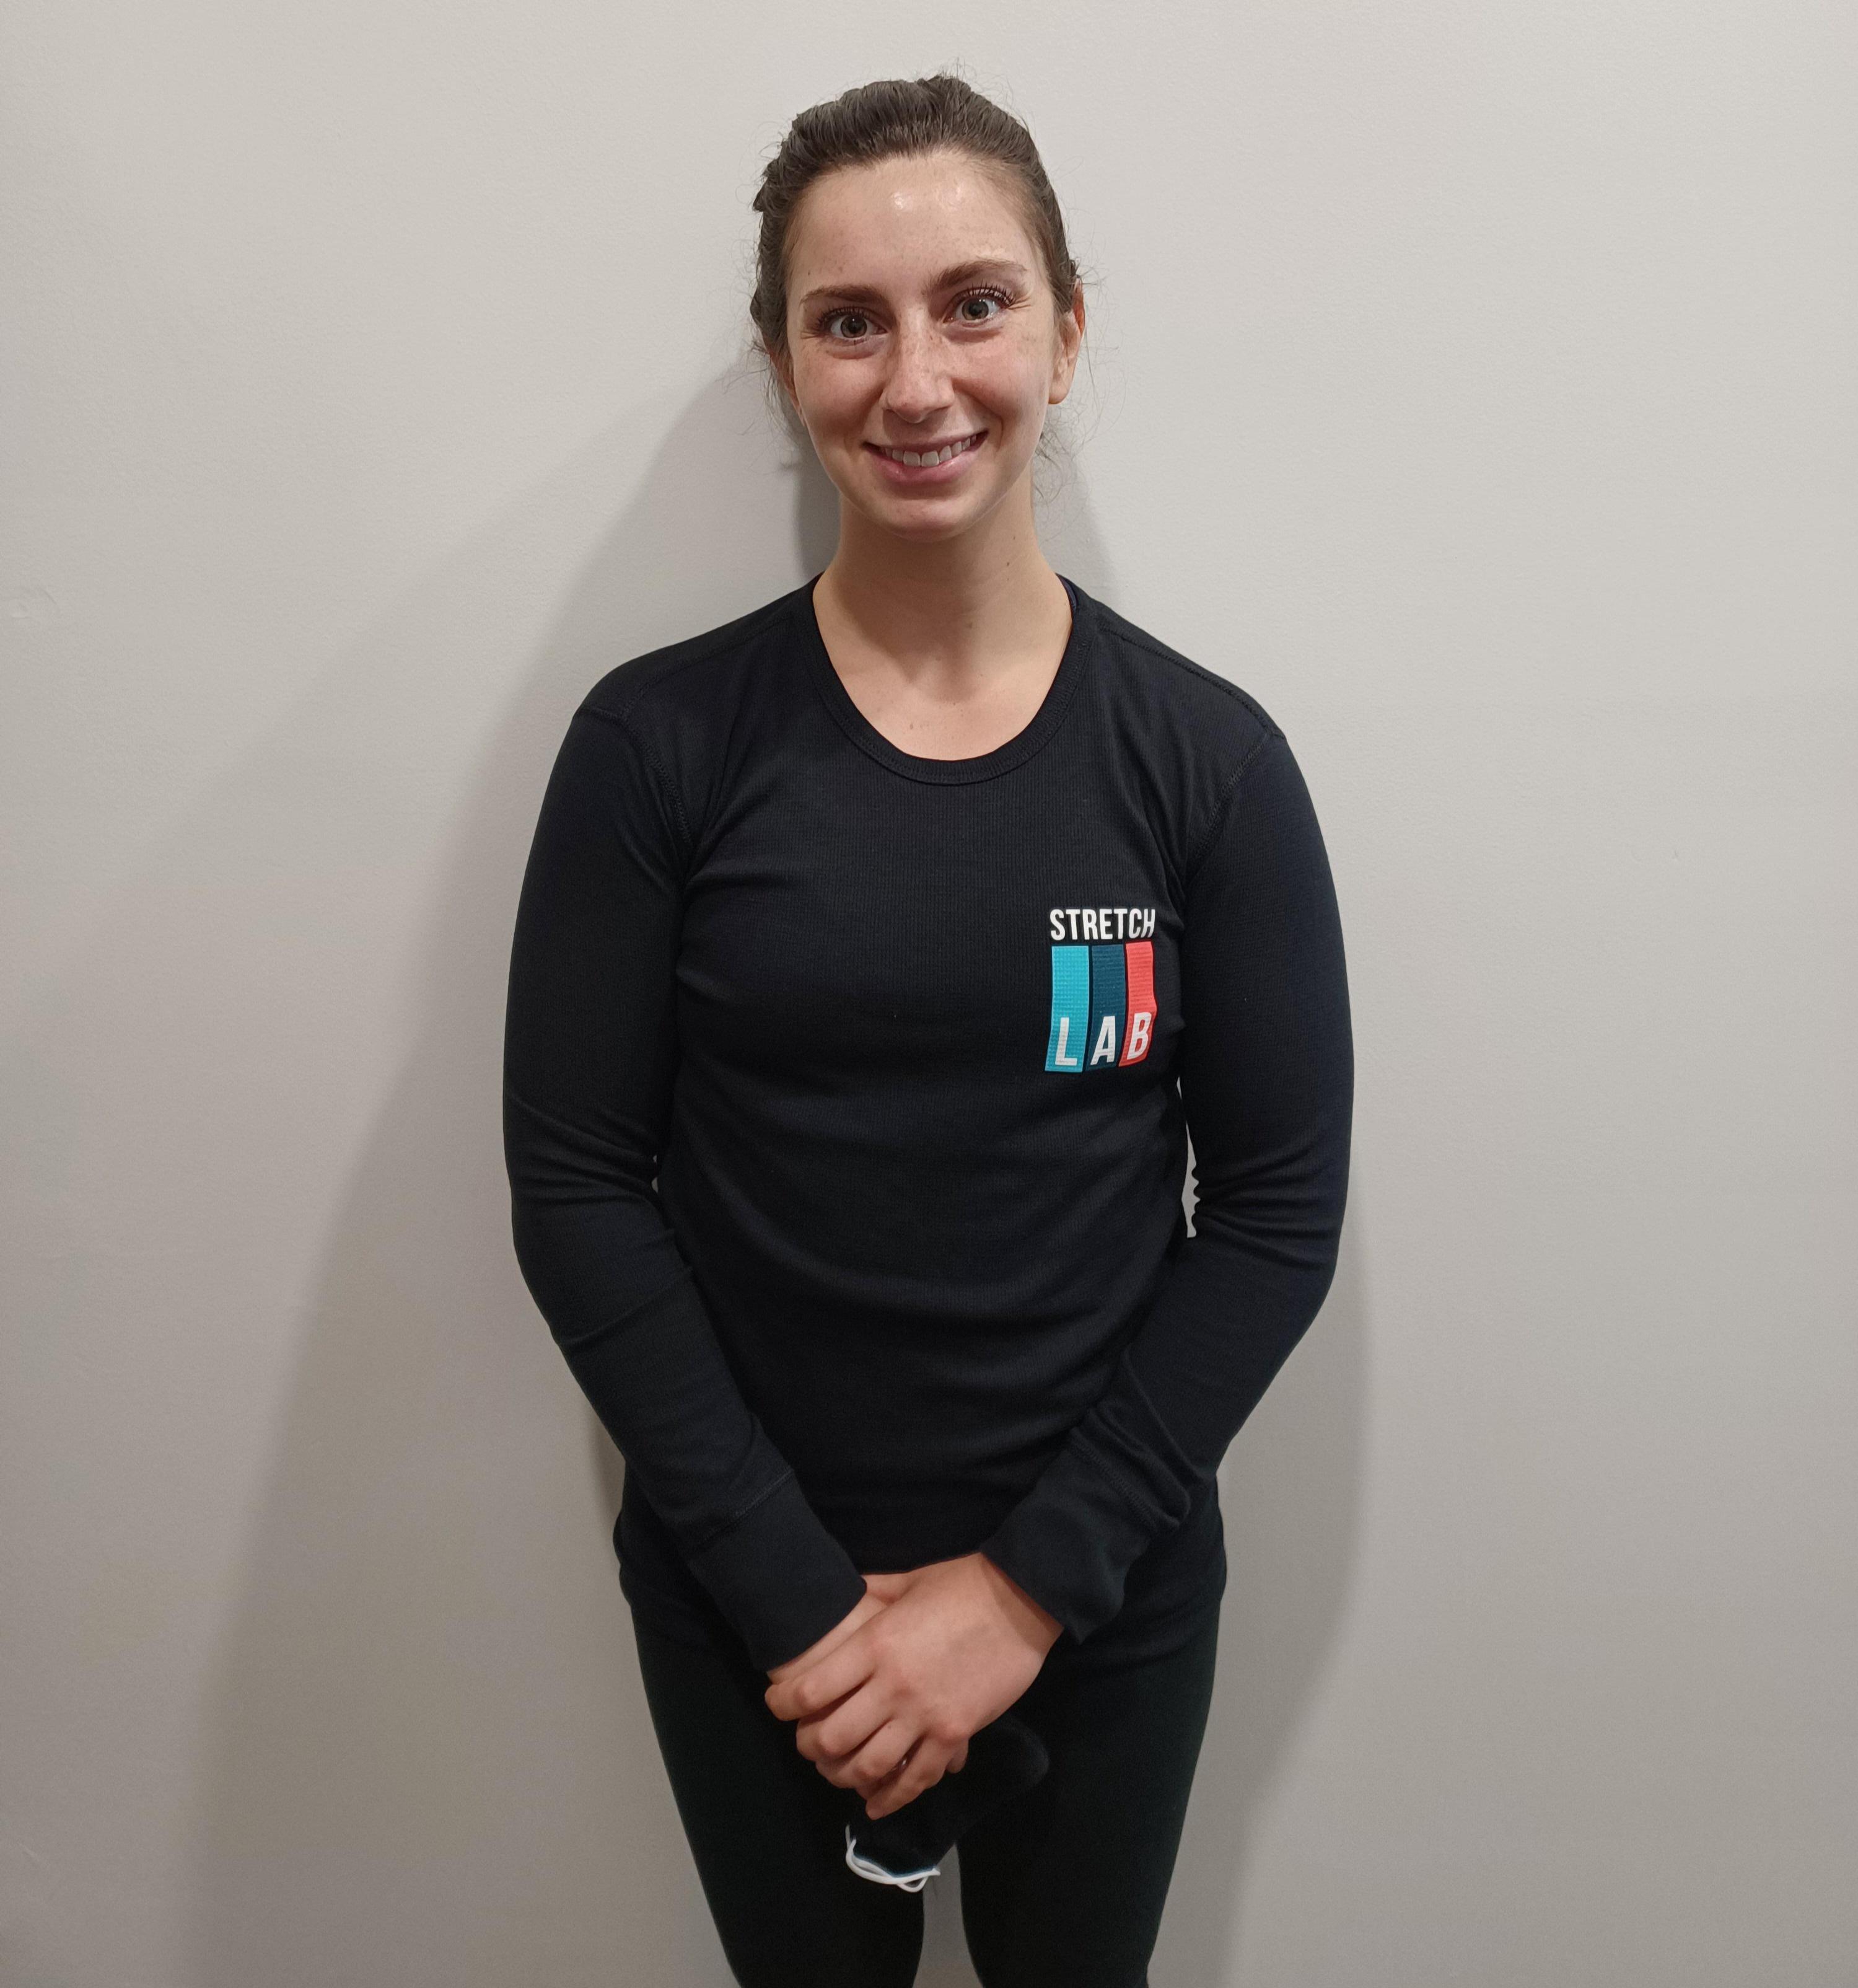 Catalina Cavotta